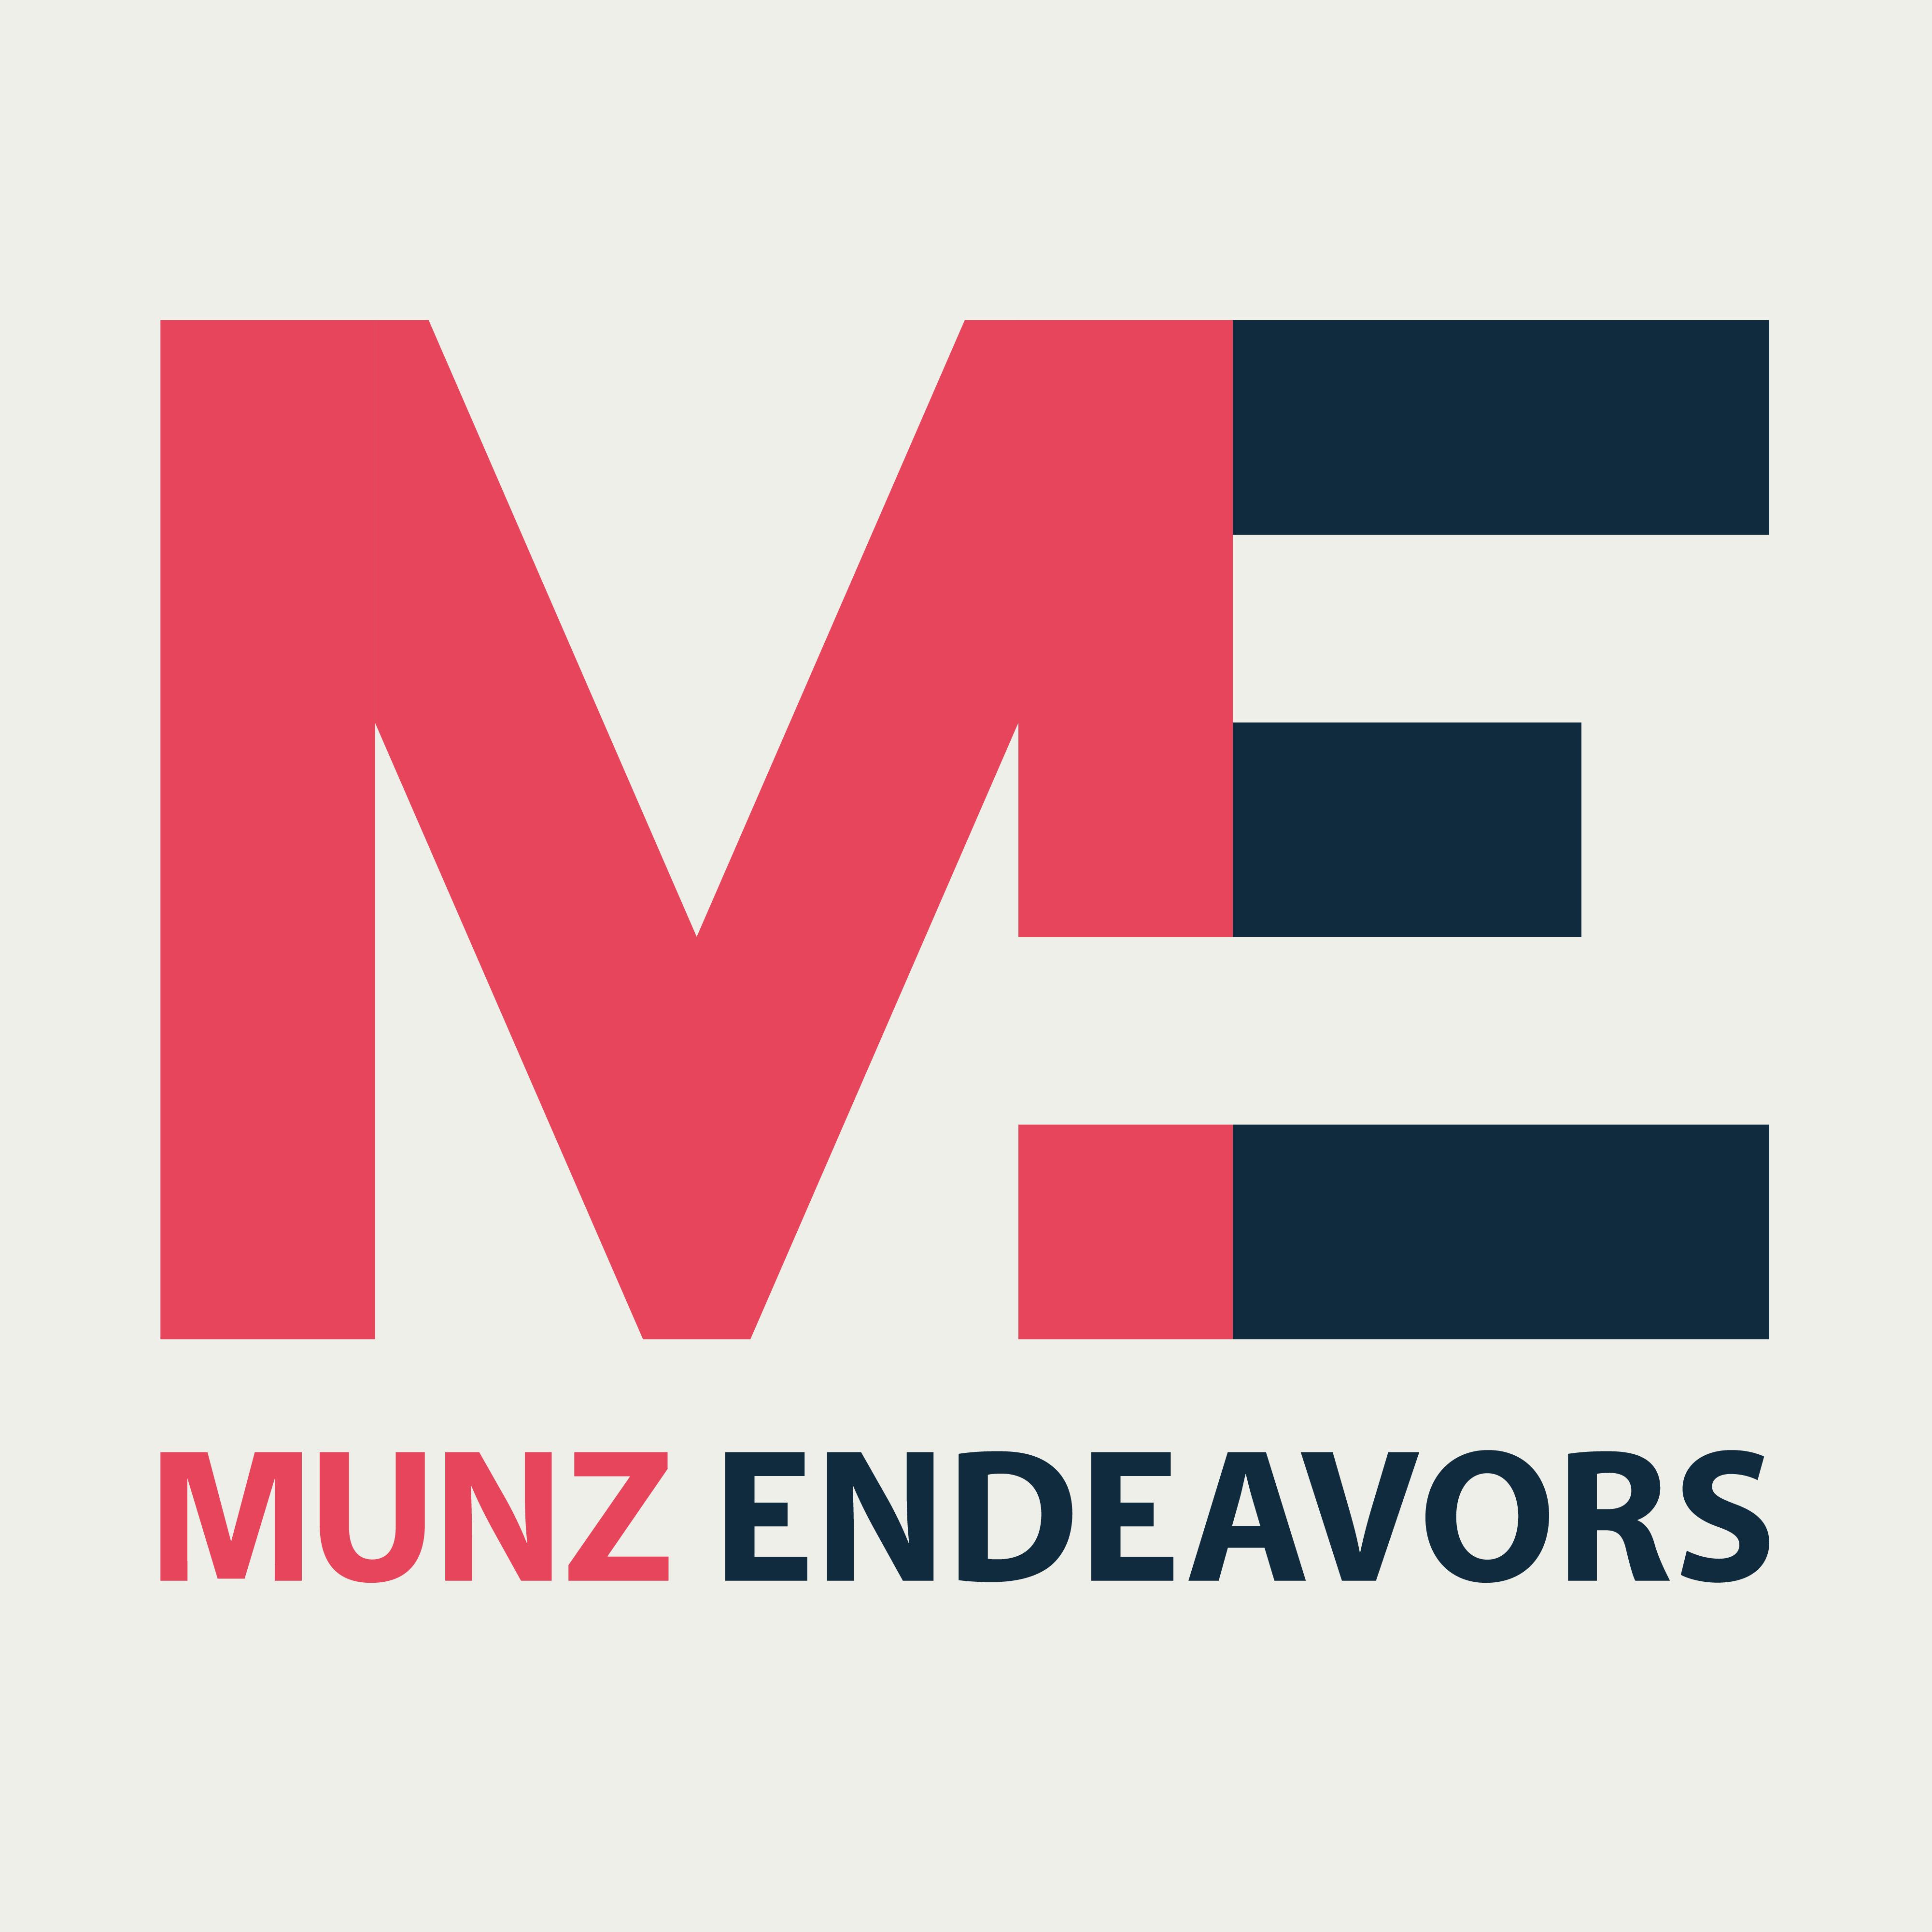 Munz Endeavors GmbH